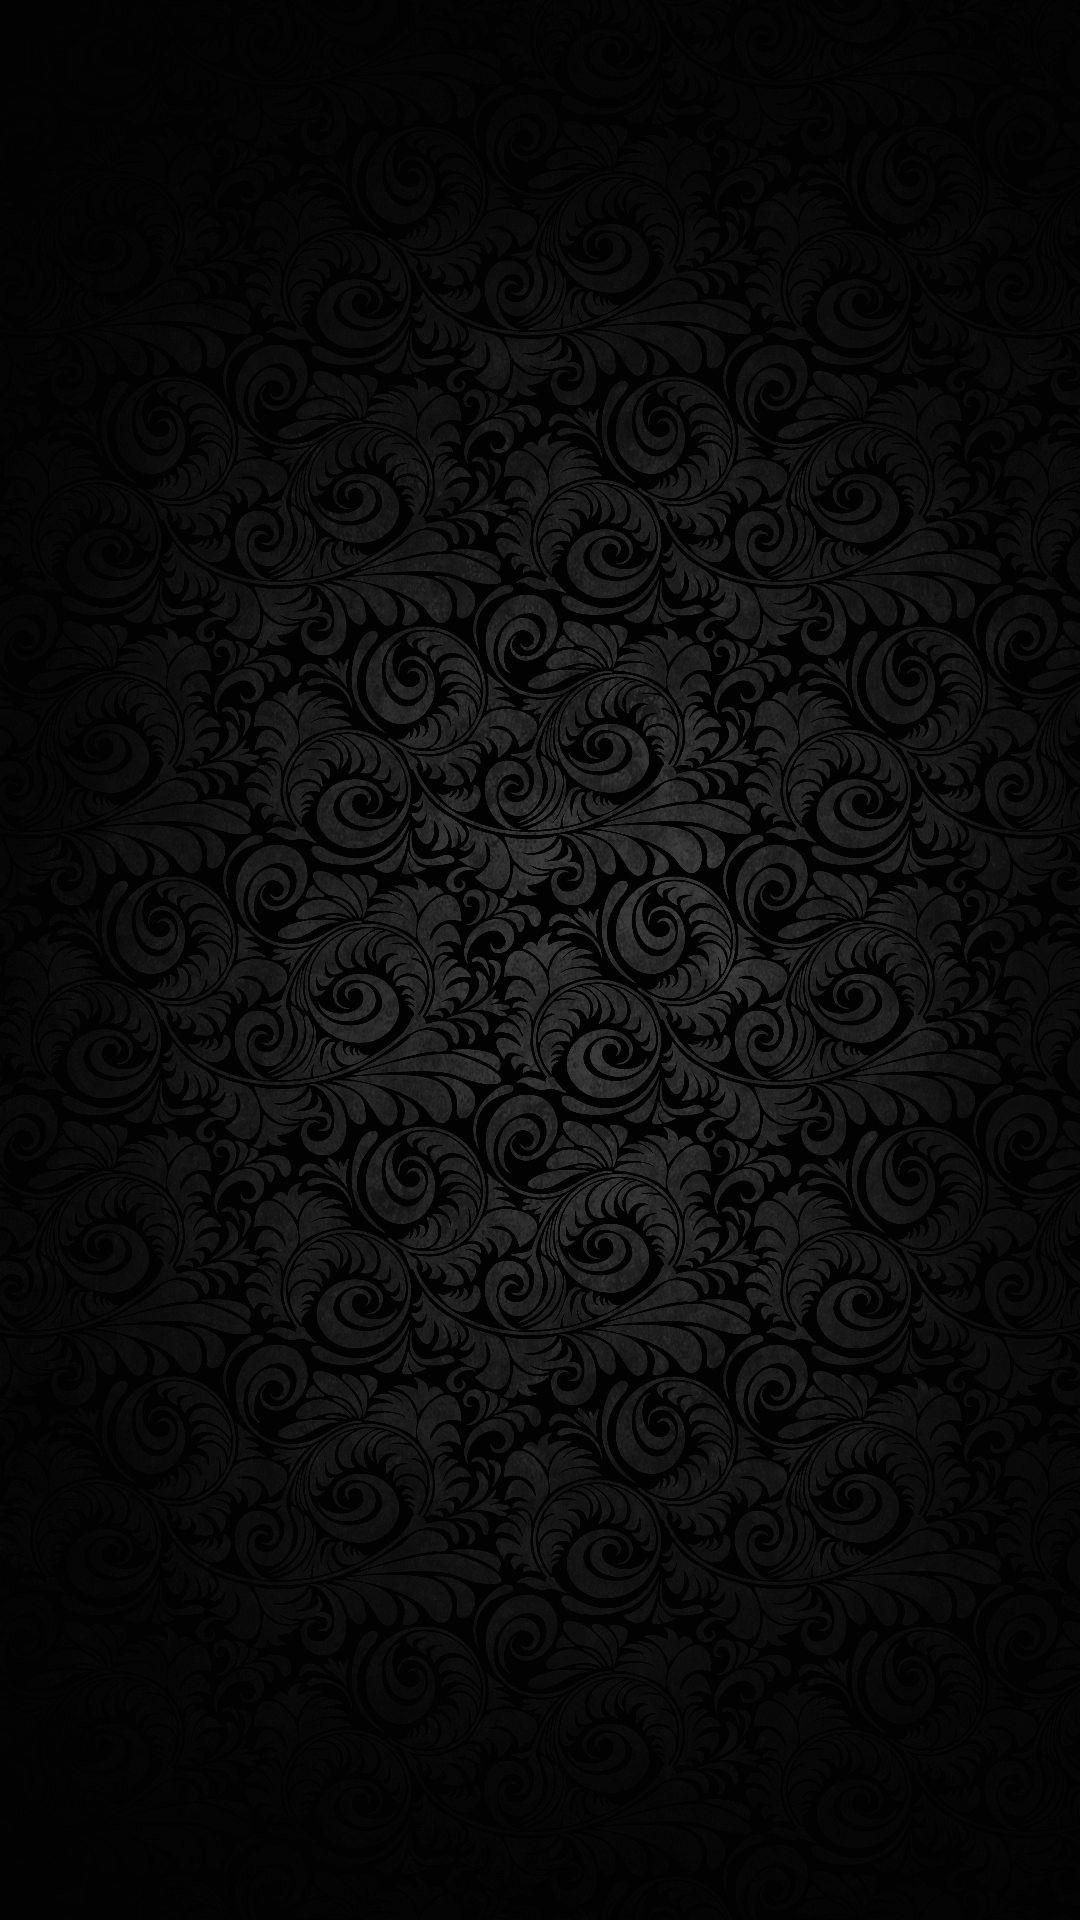 Black Royal Background Black Hd Wallpaper Hd Wallpaper Android Black Wallpaper